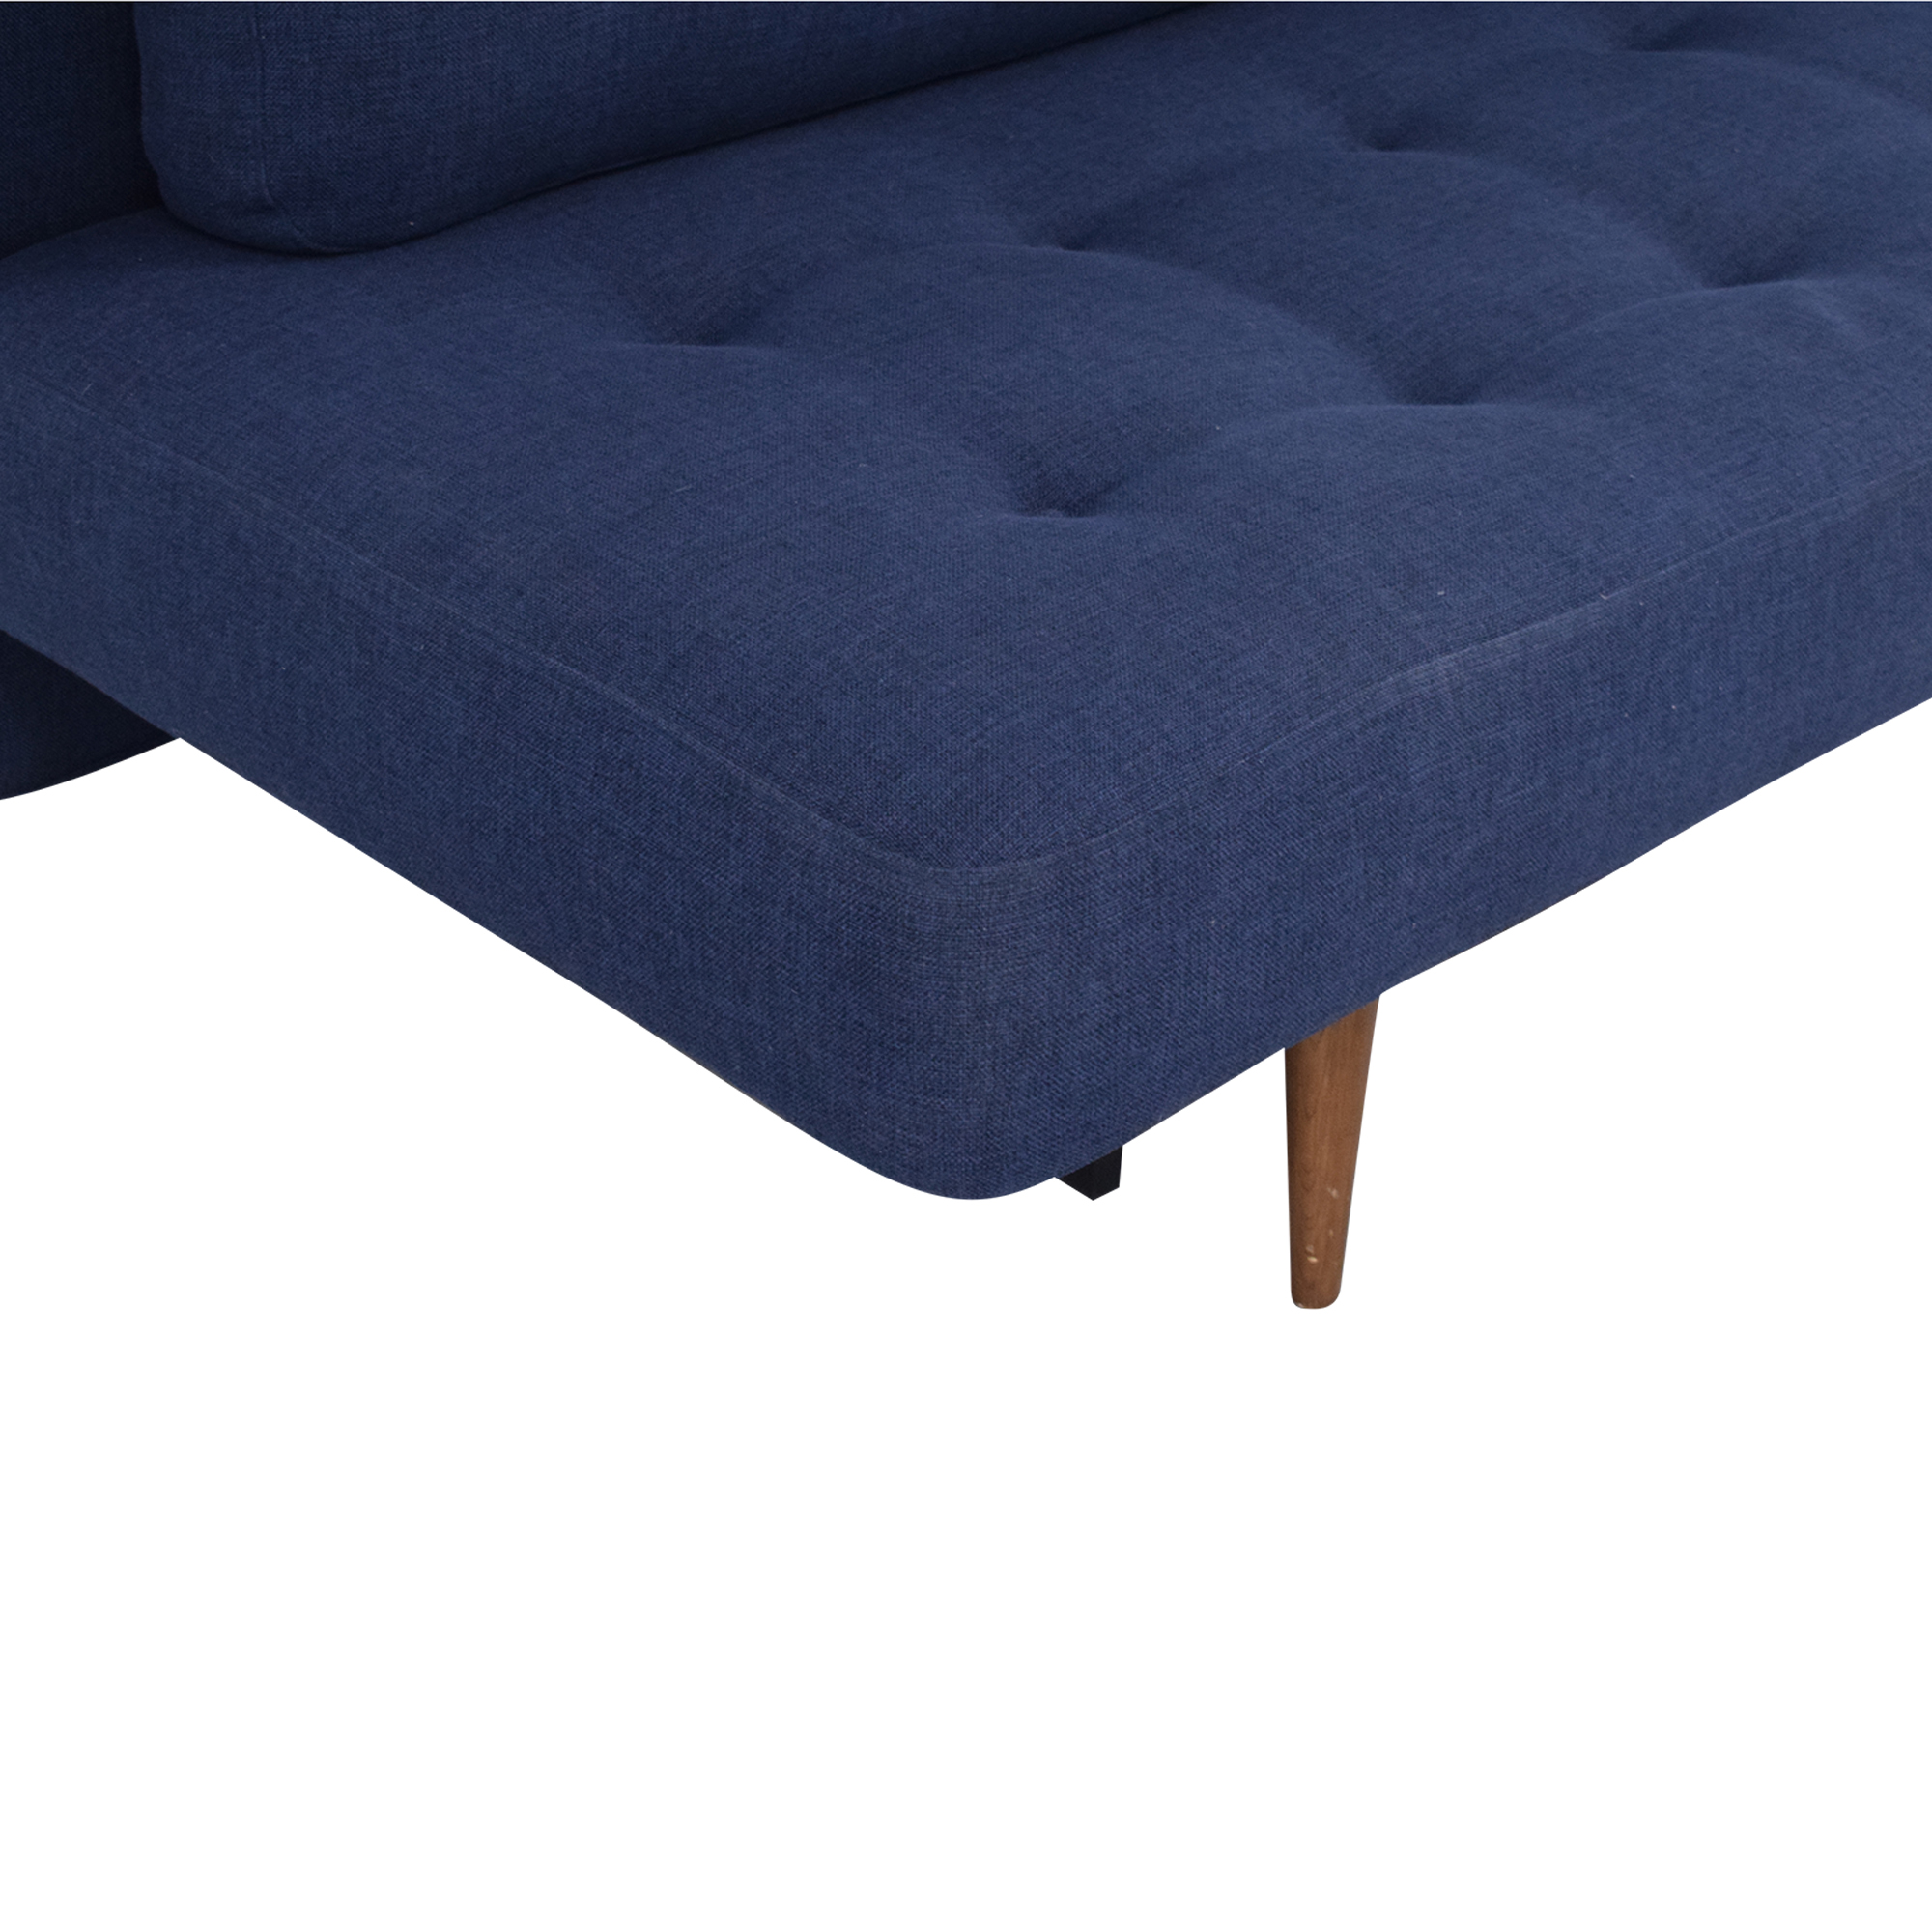 Room & Board Room & Board Deco Convertible Sleeper Sofa Classic Sofas